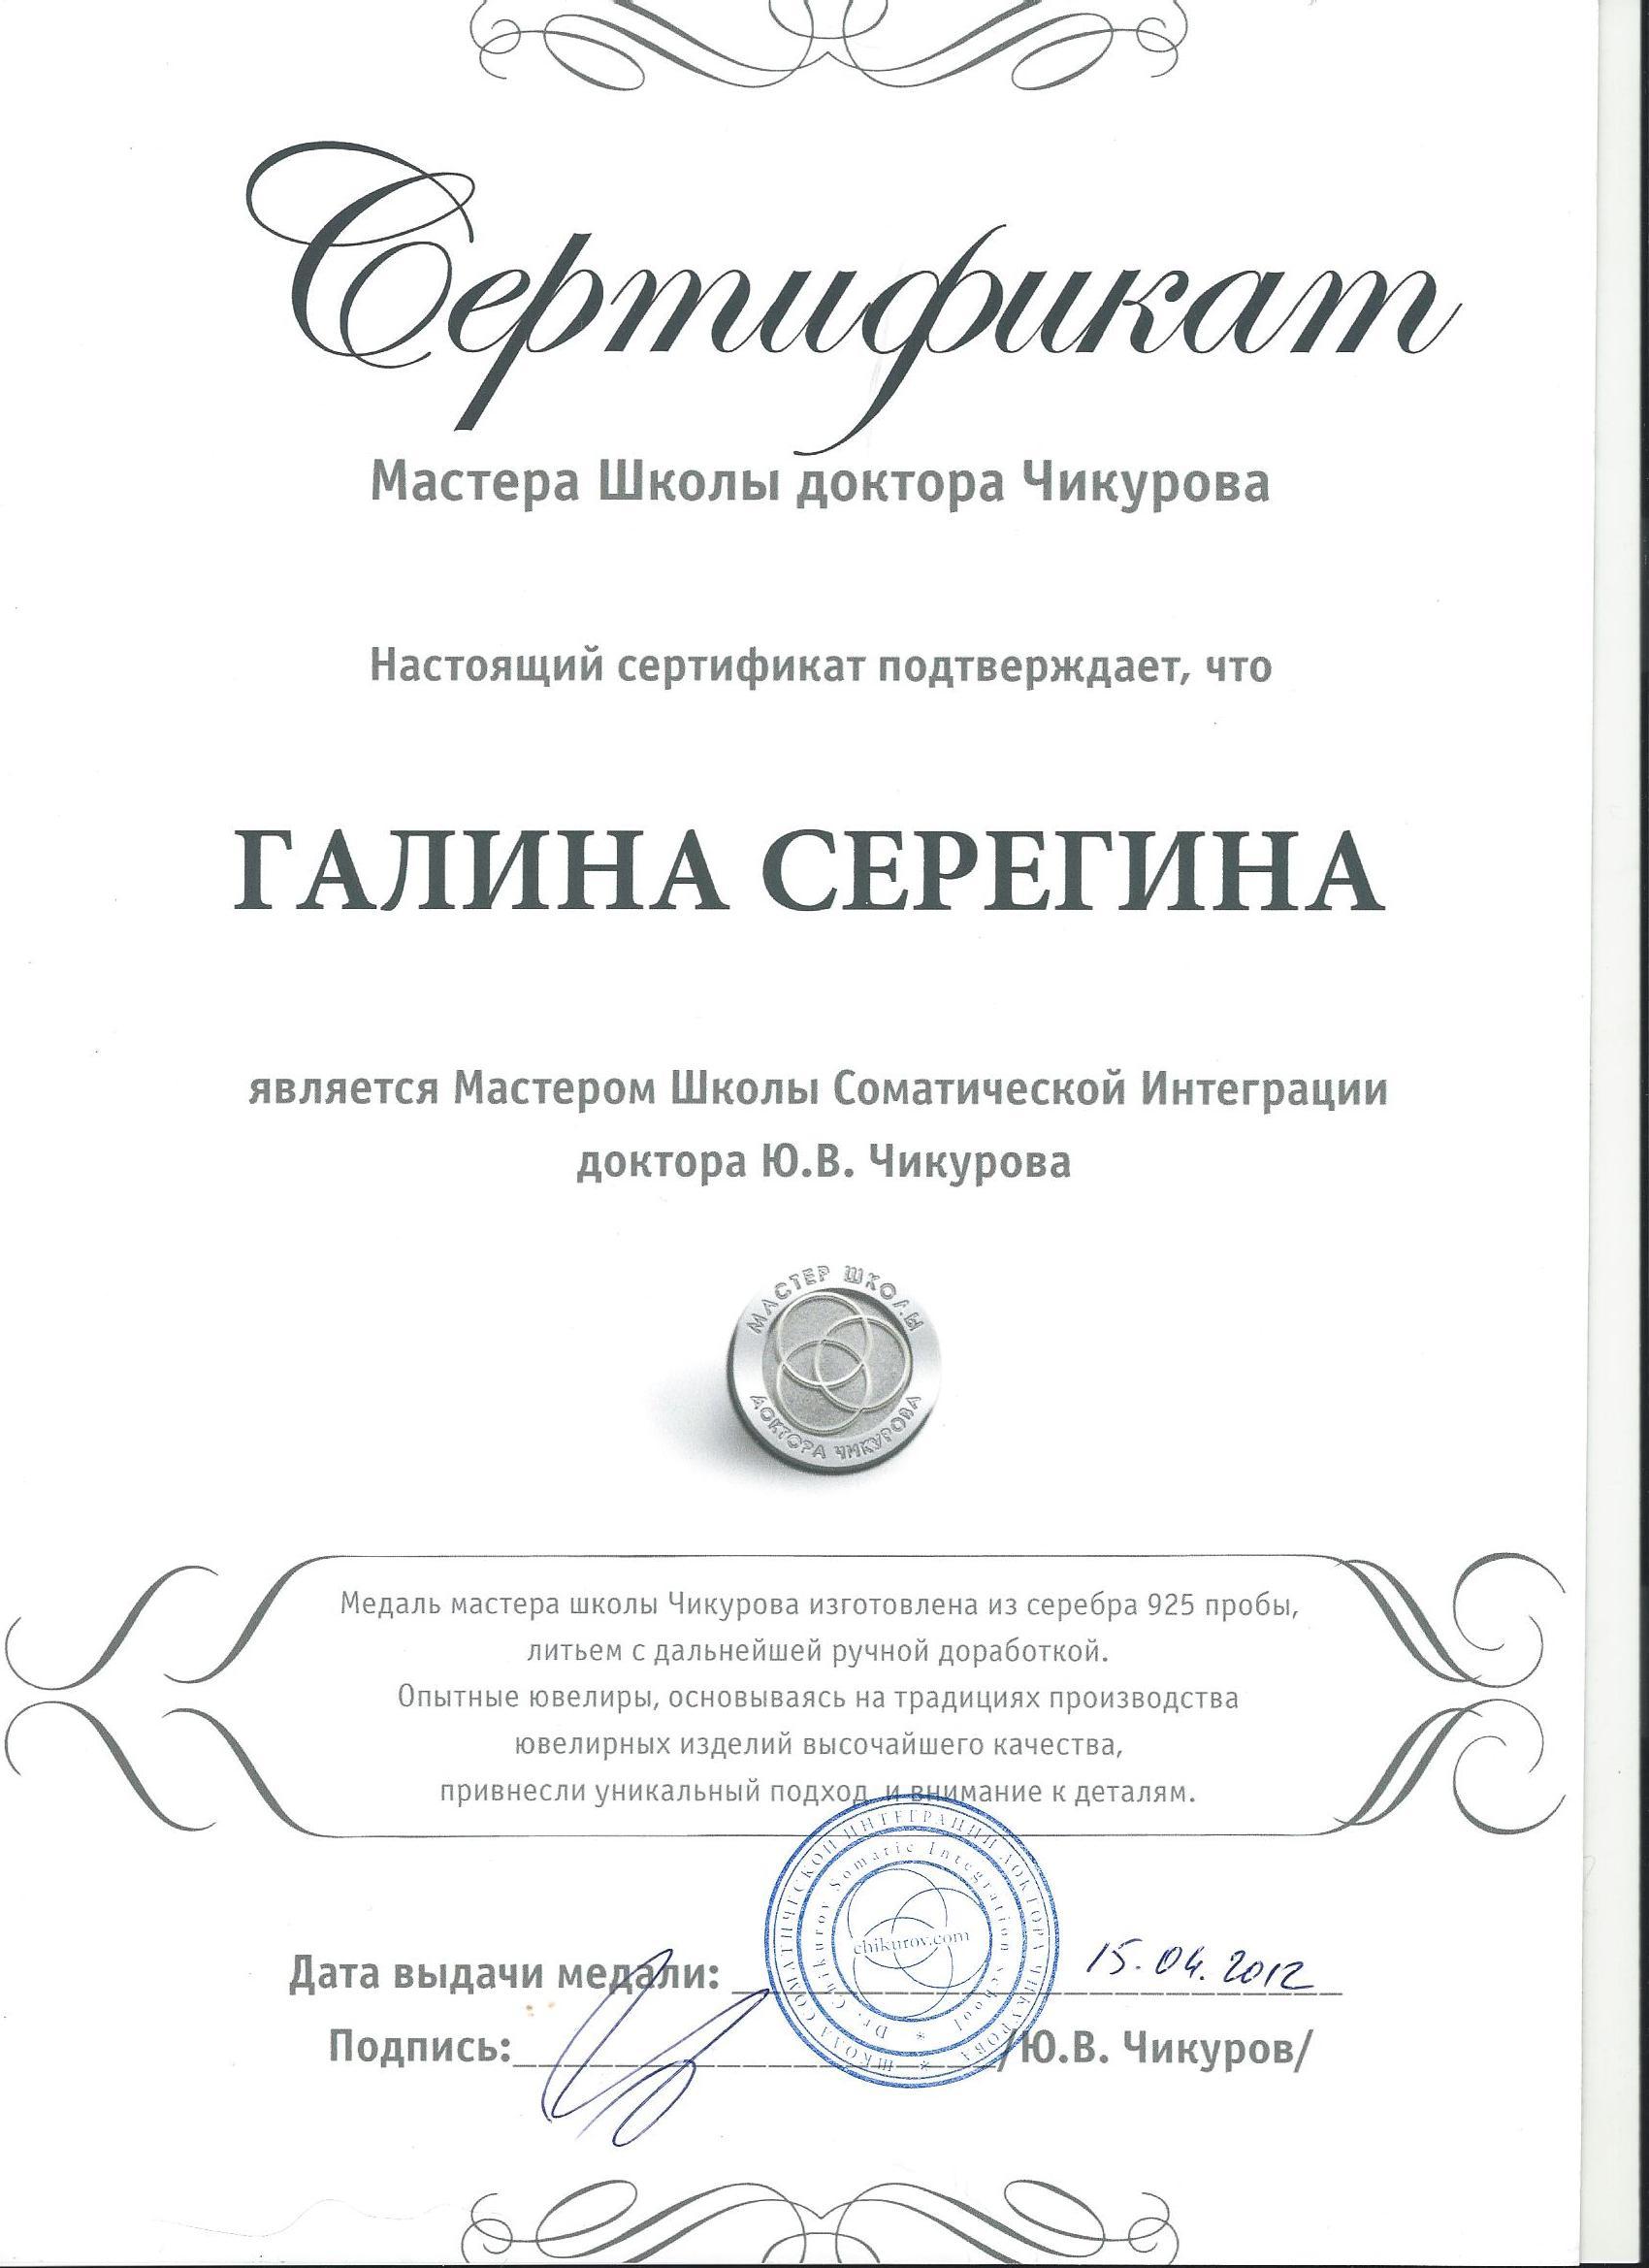 Сертификат школы Чикурова